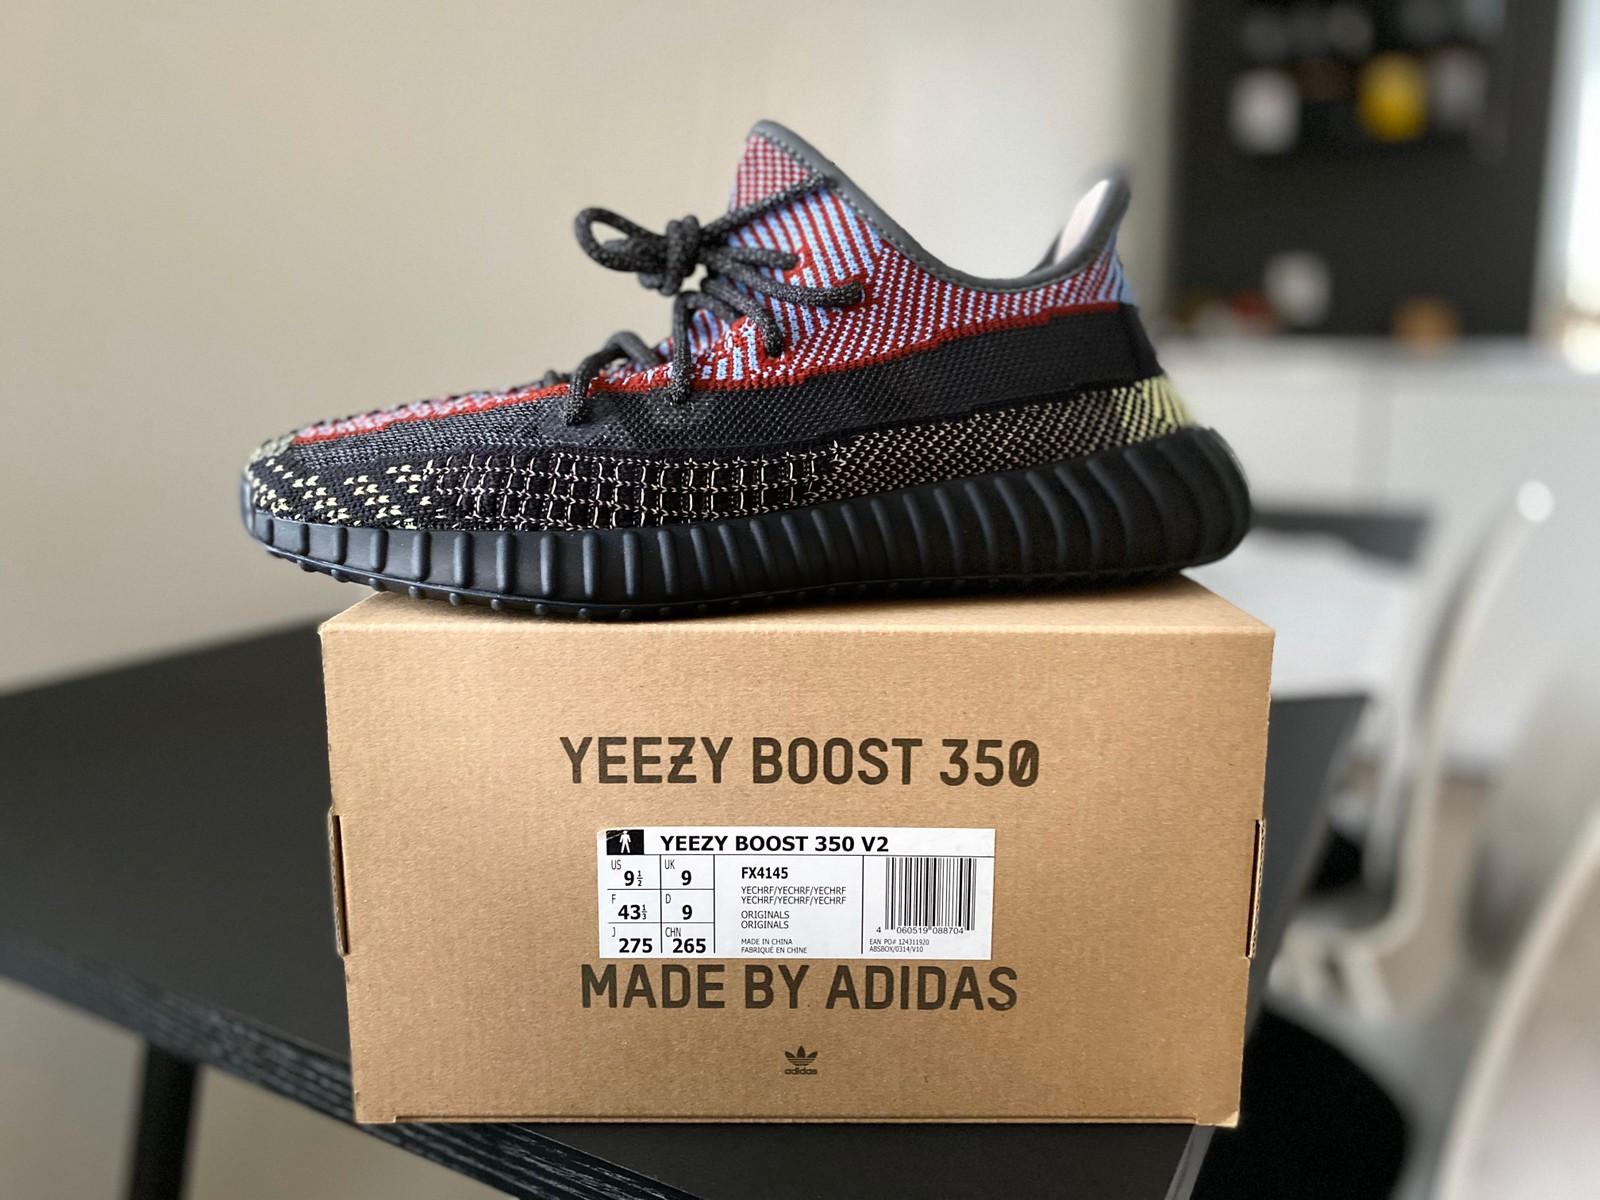 Adidas Yeezy Boost 350 V2 Yecheil reflective US 6